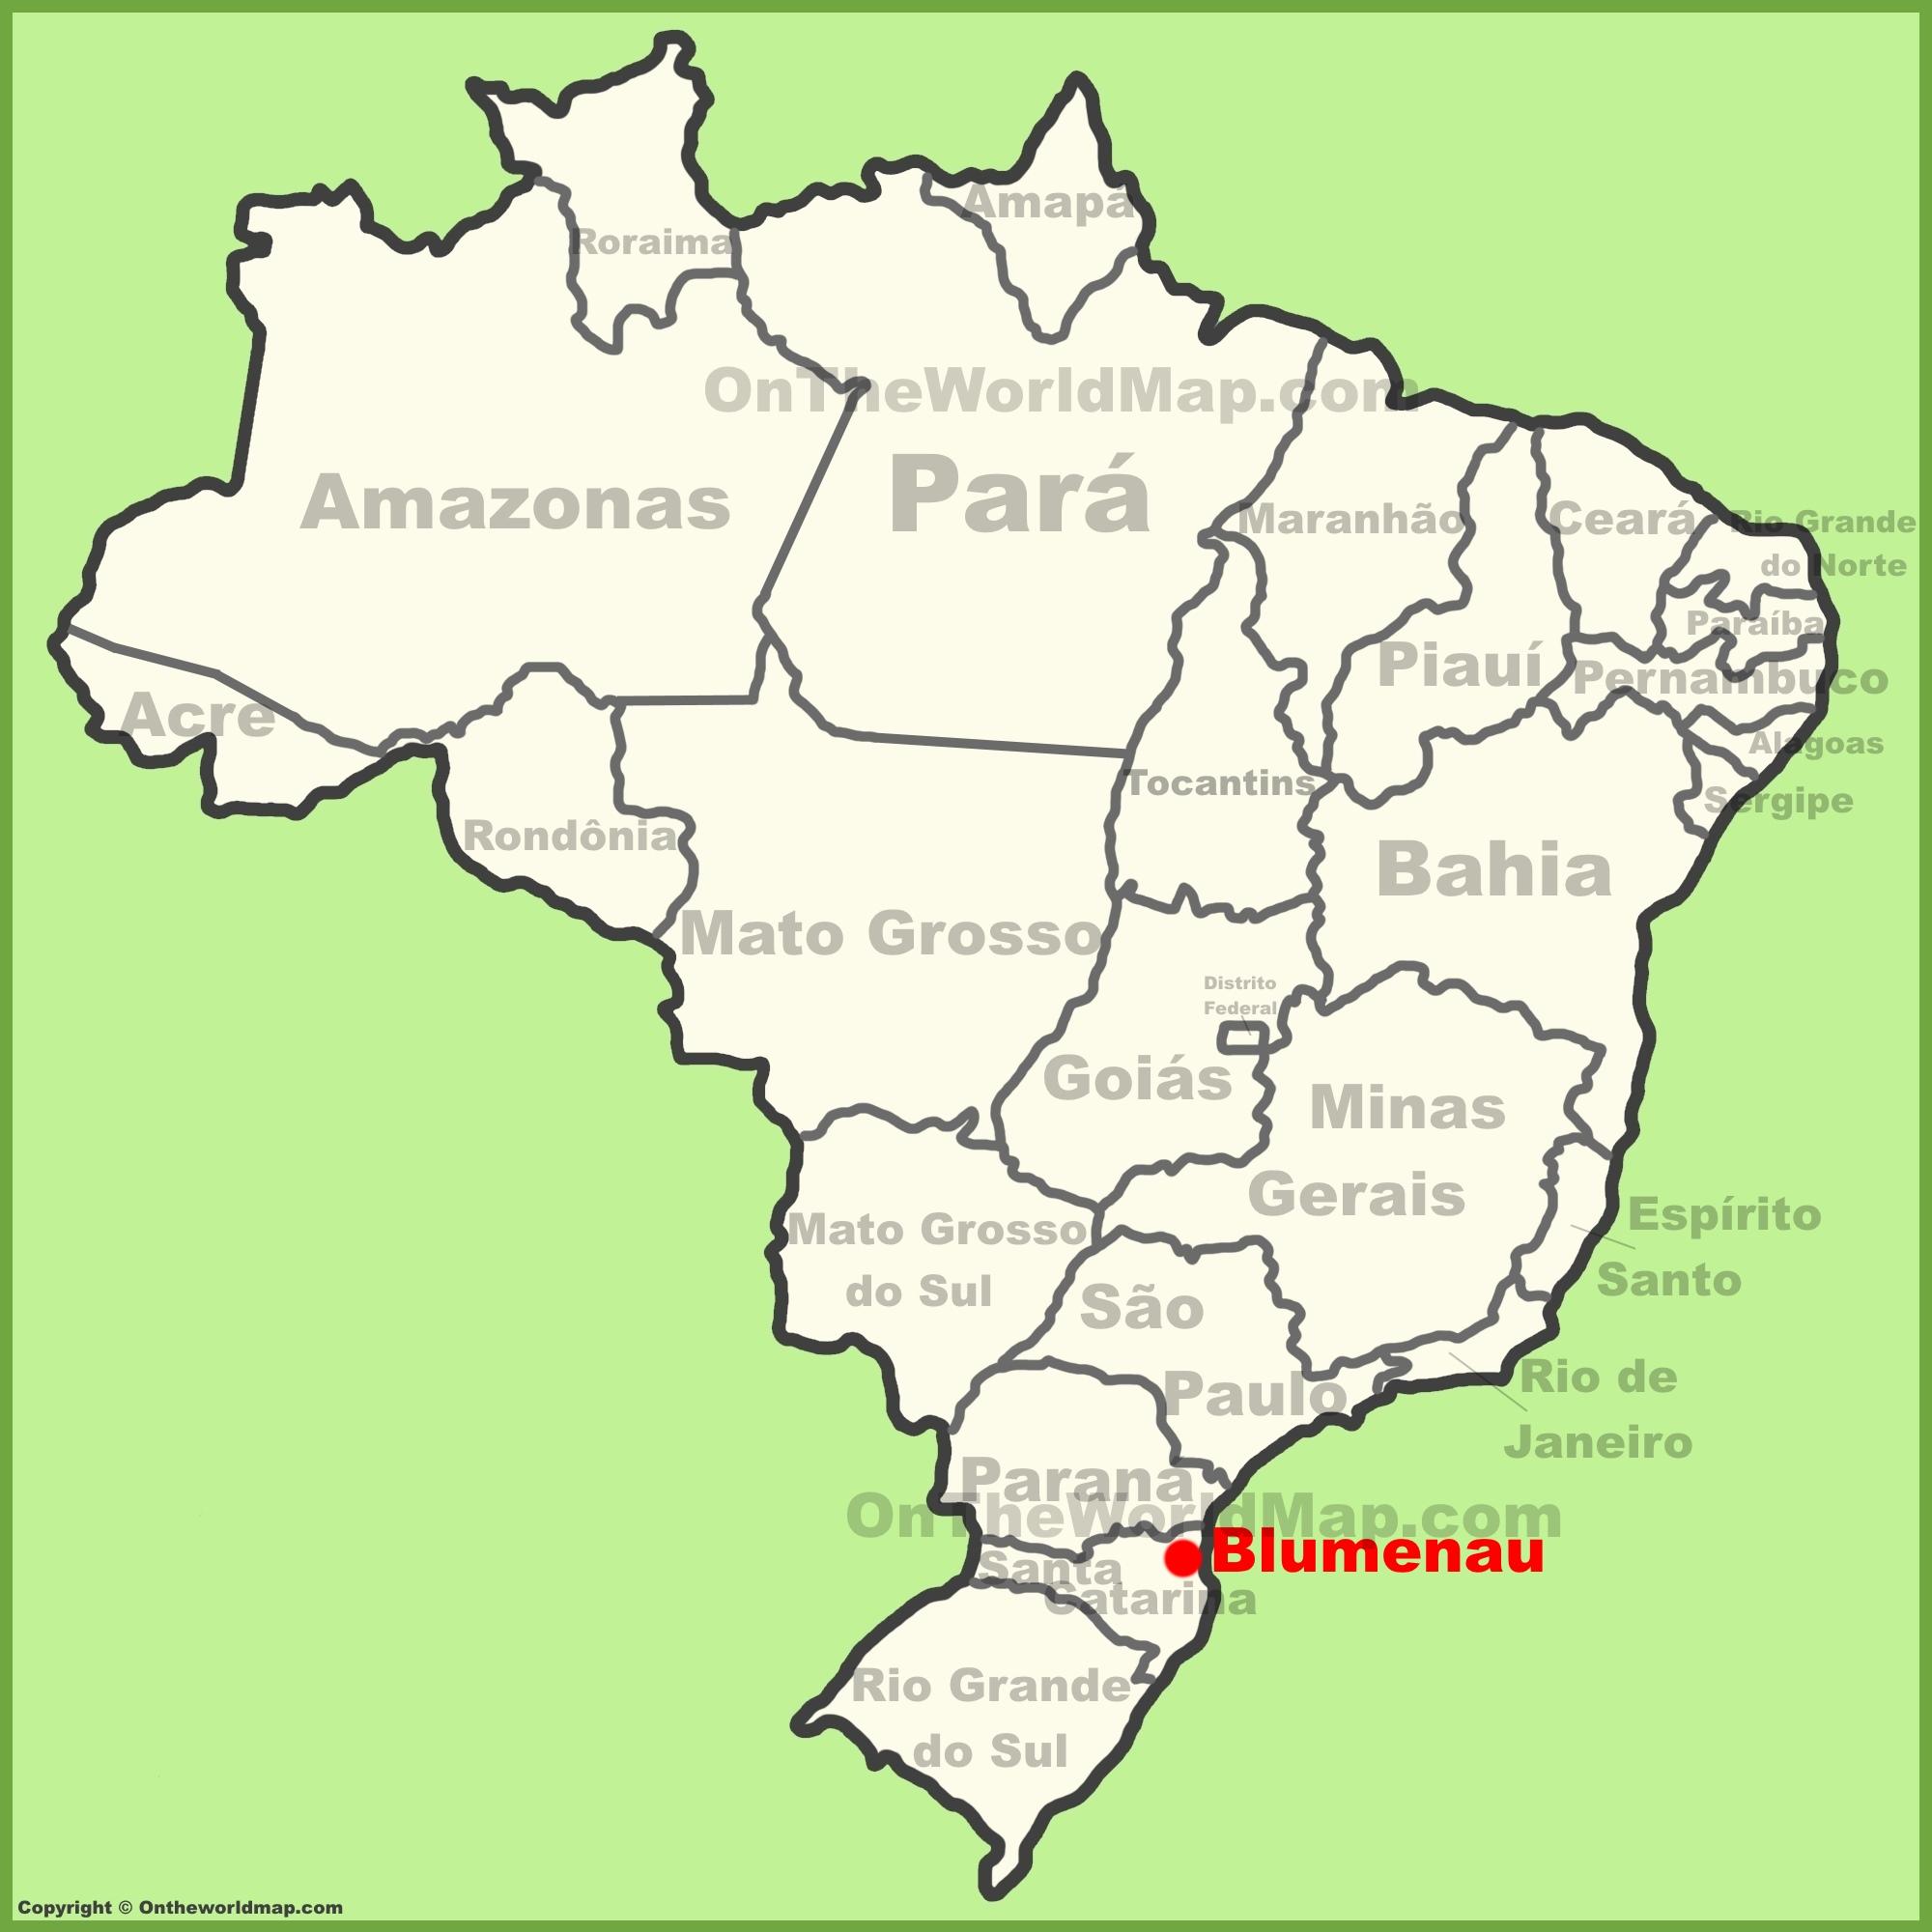 Blumenau location on the Brazil map